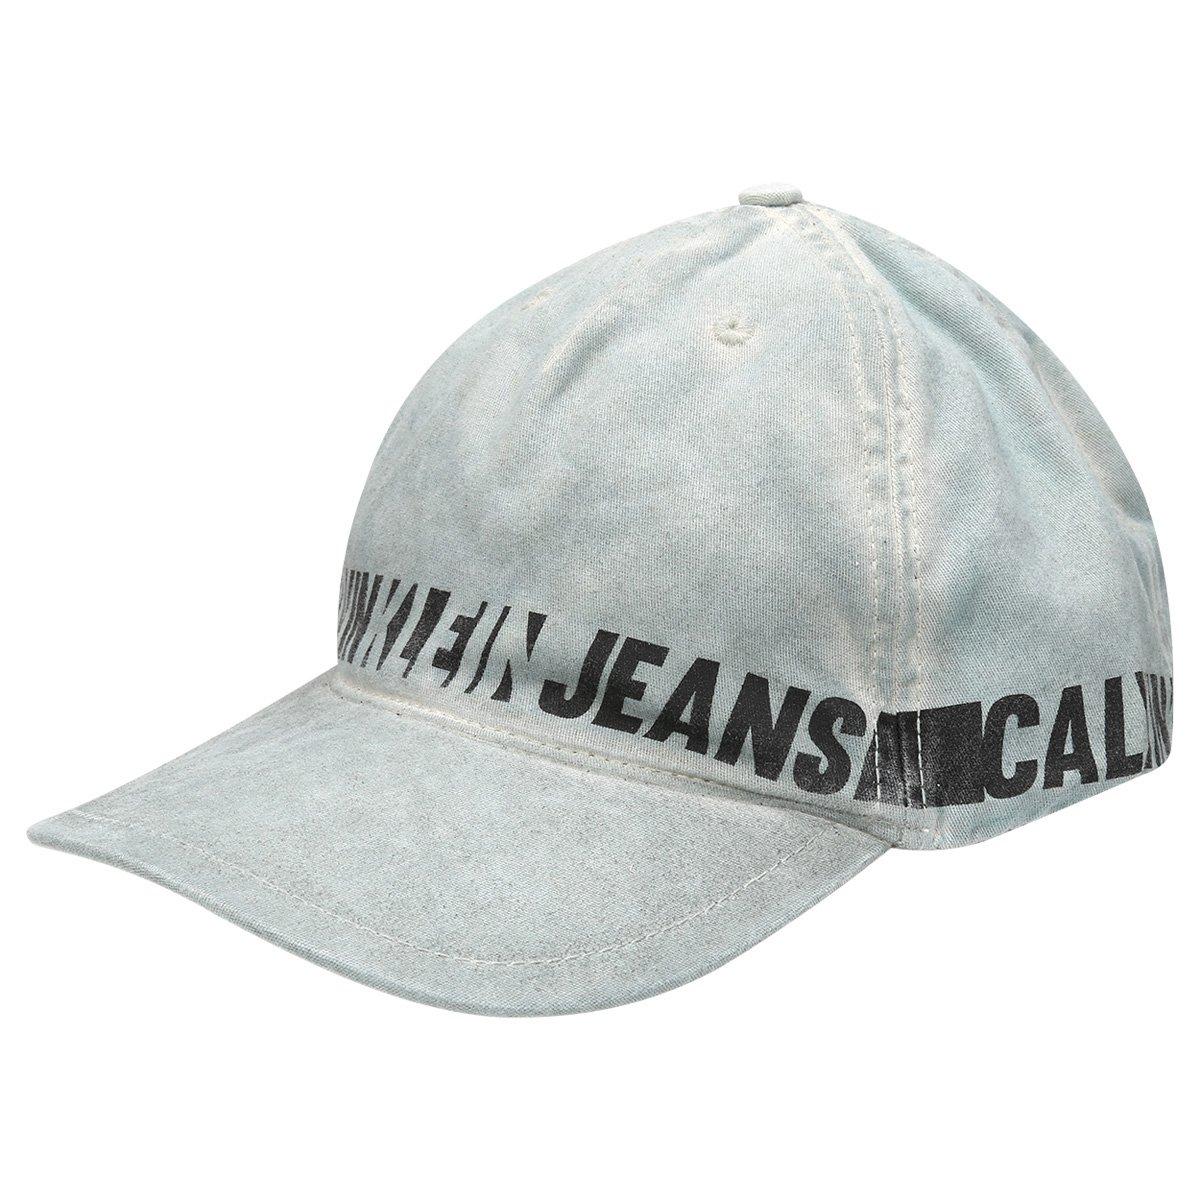 Boné Calvin Klein Tie Dye Logo - Compre Agora   Netshoes 69a0f02d4b